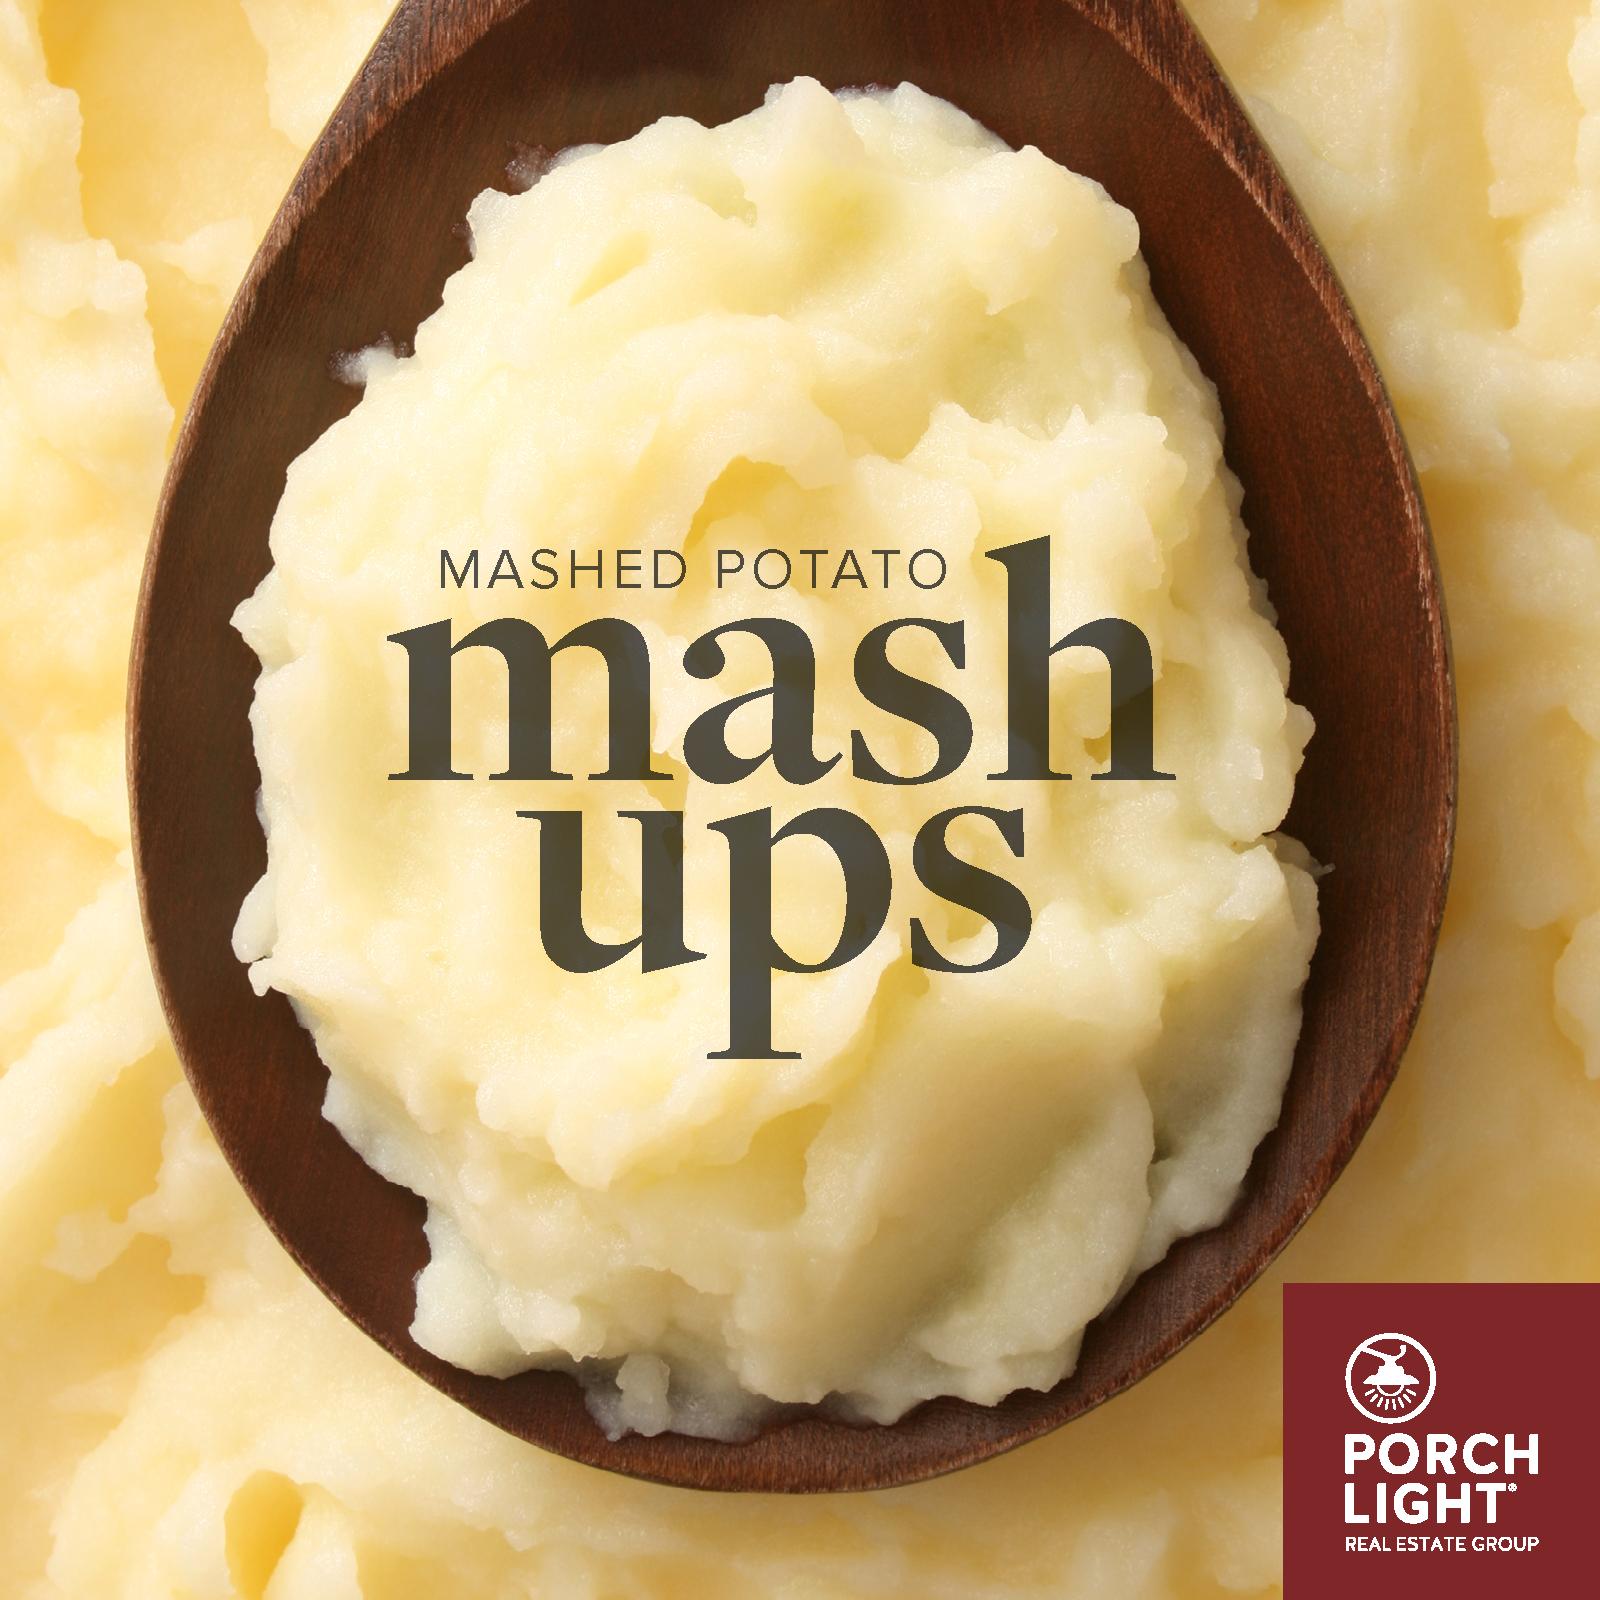 Mahed Potato mash ups